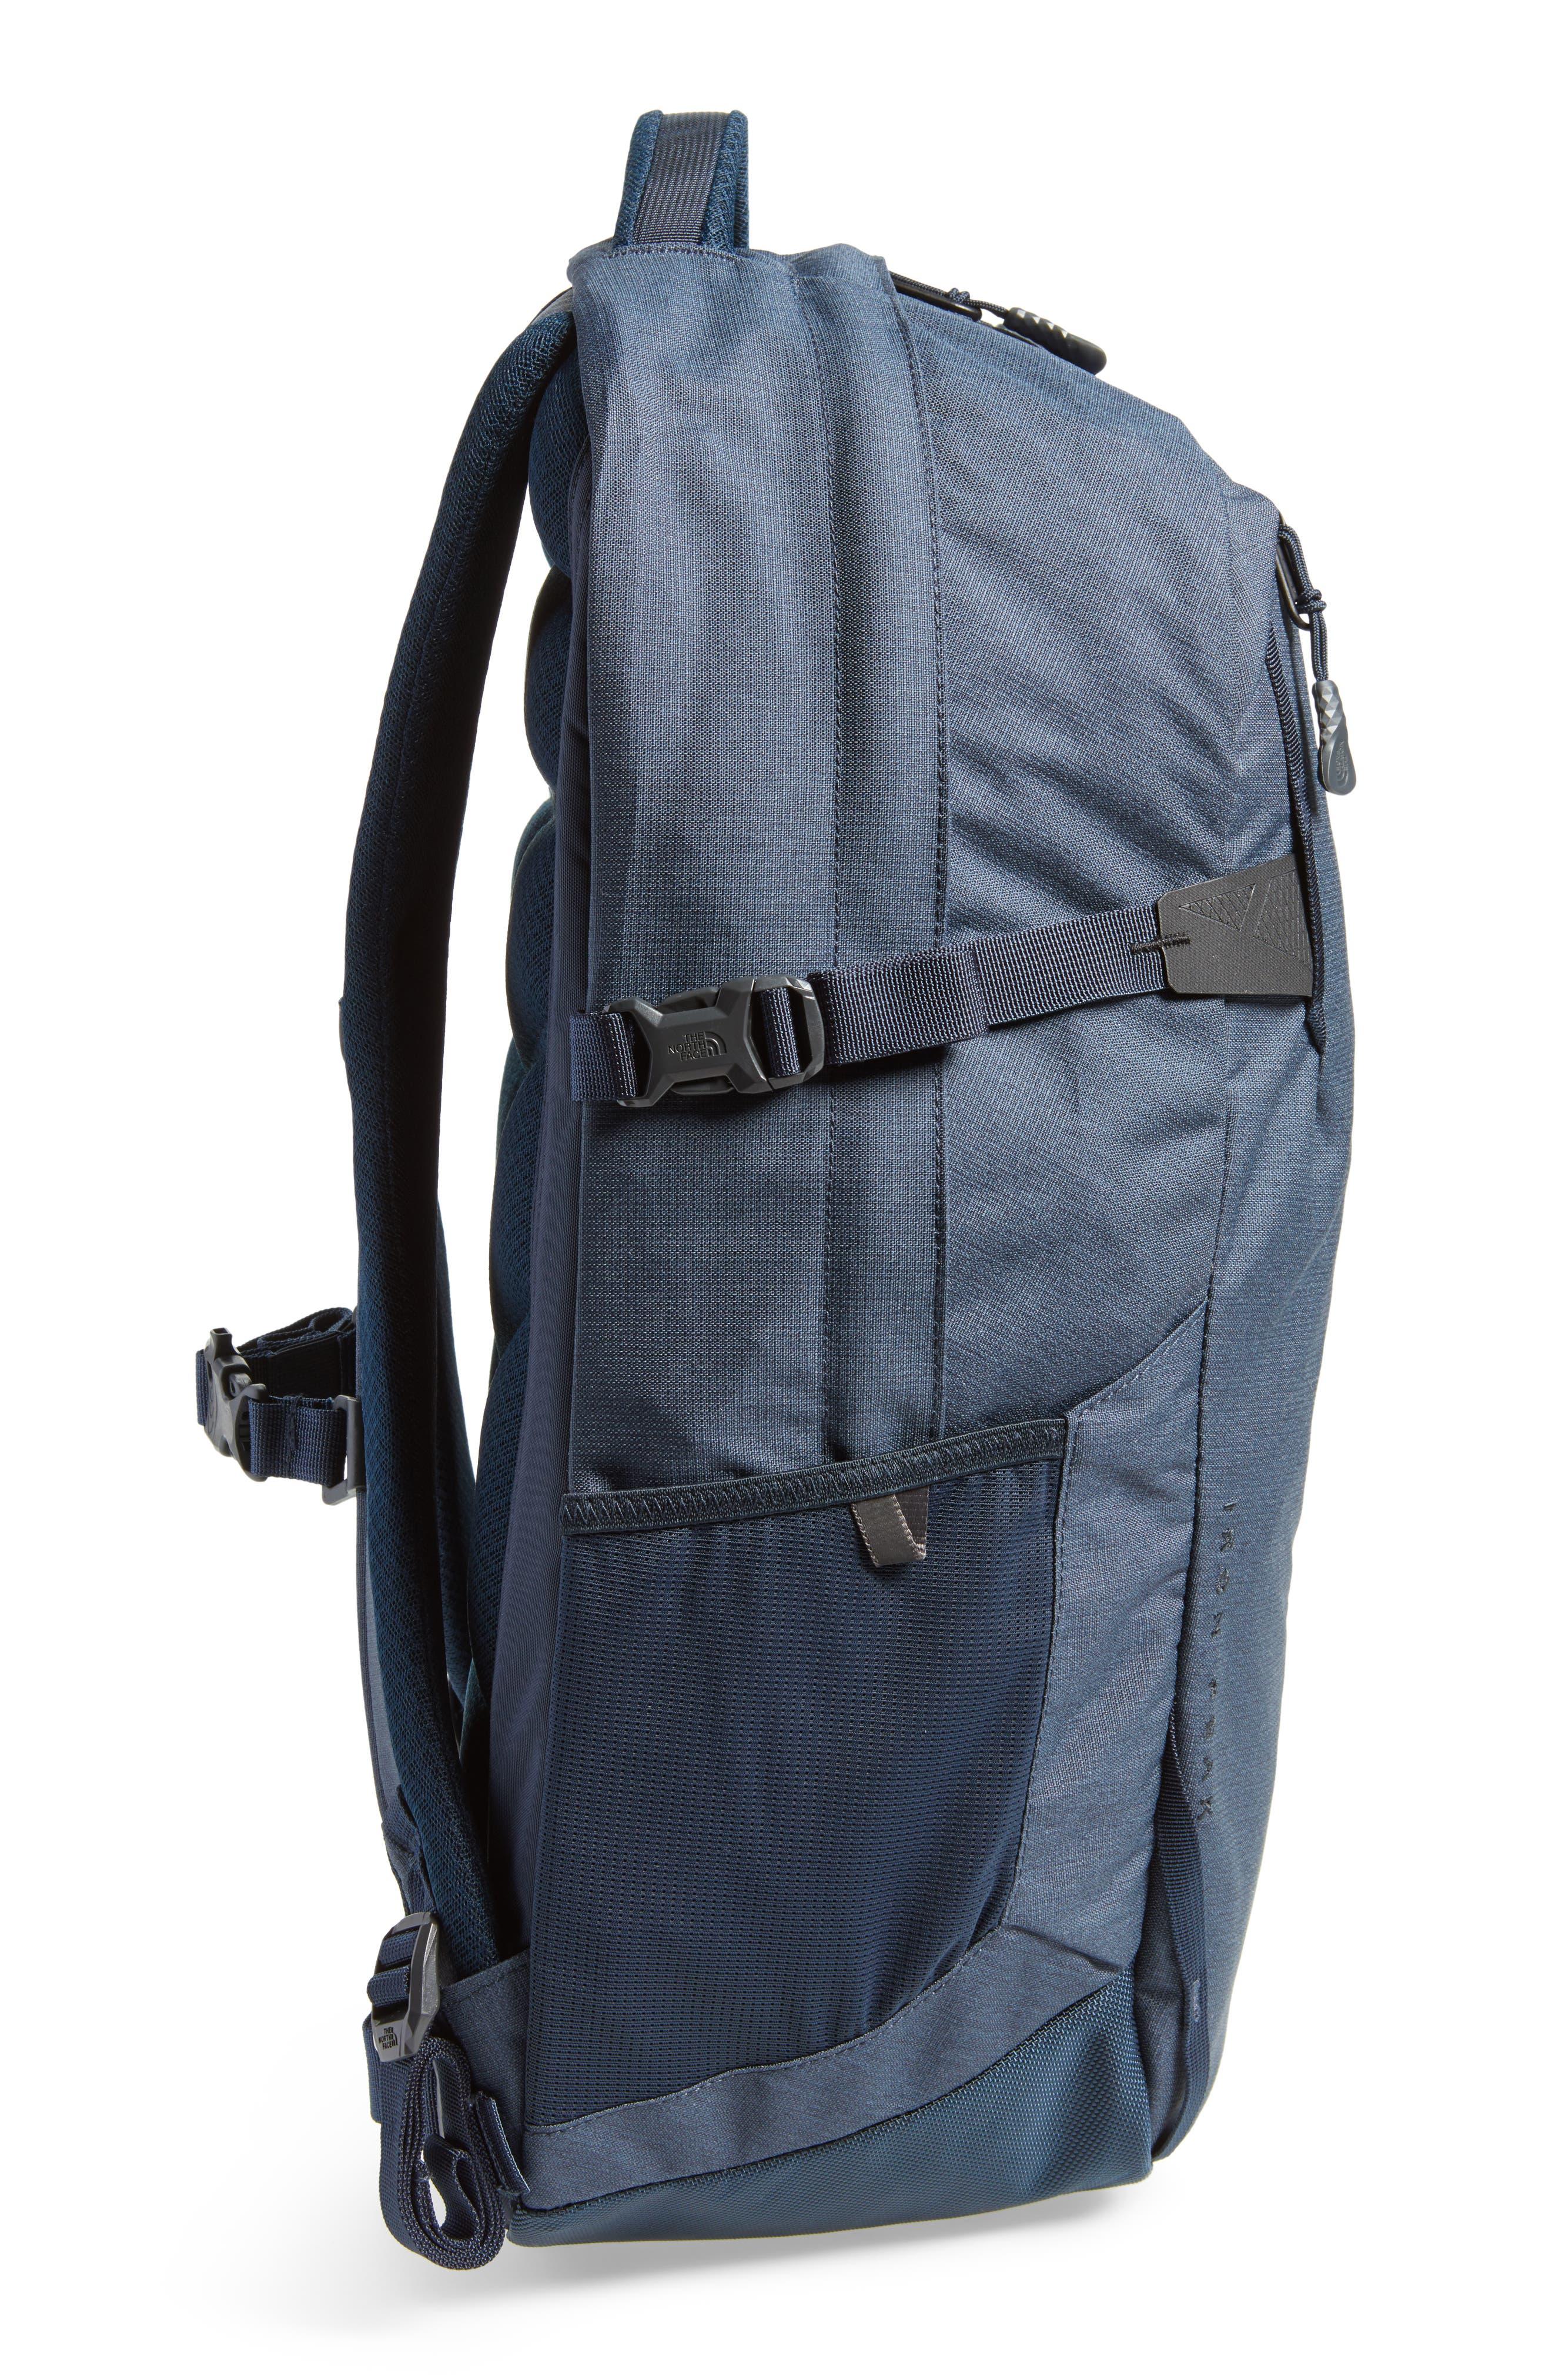 Iron Peak Backpack,                             Alternate thumbnail 19, color,